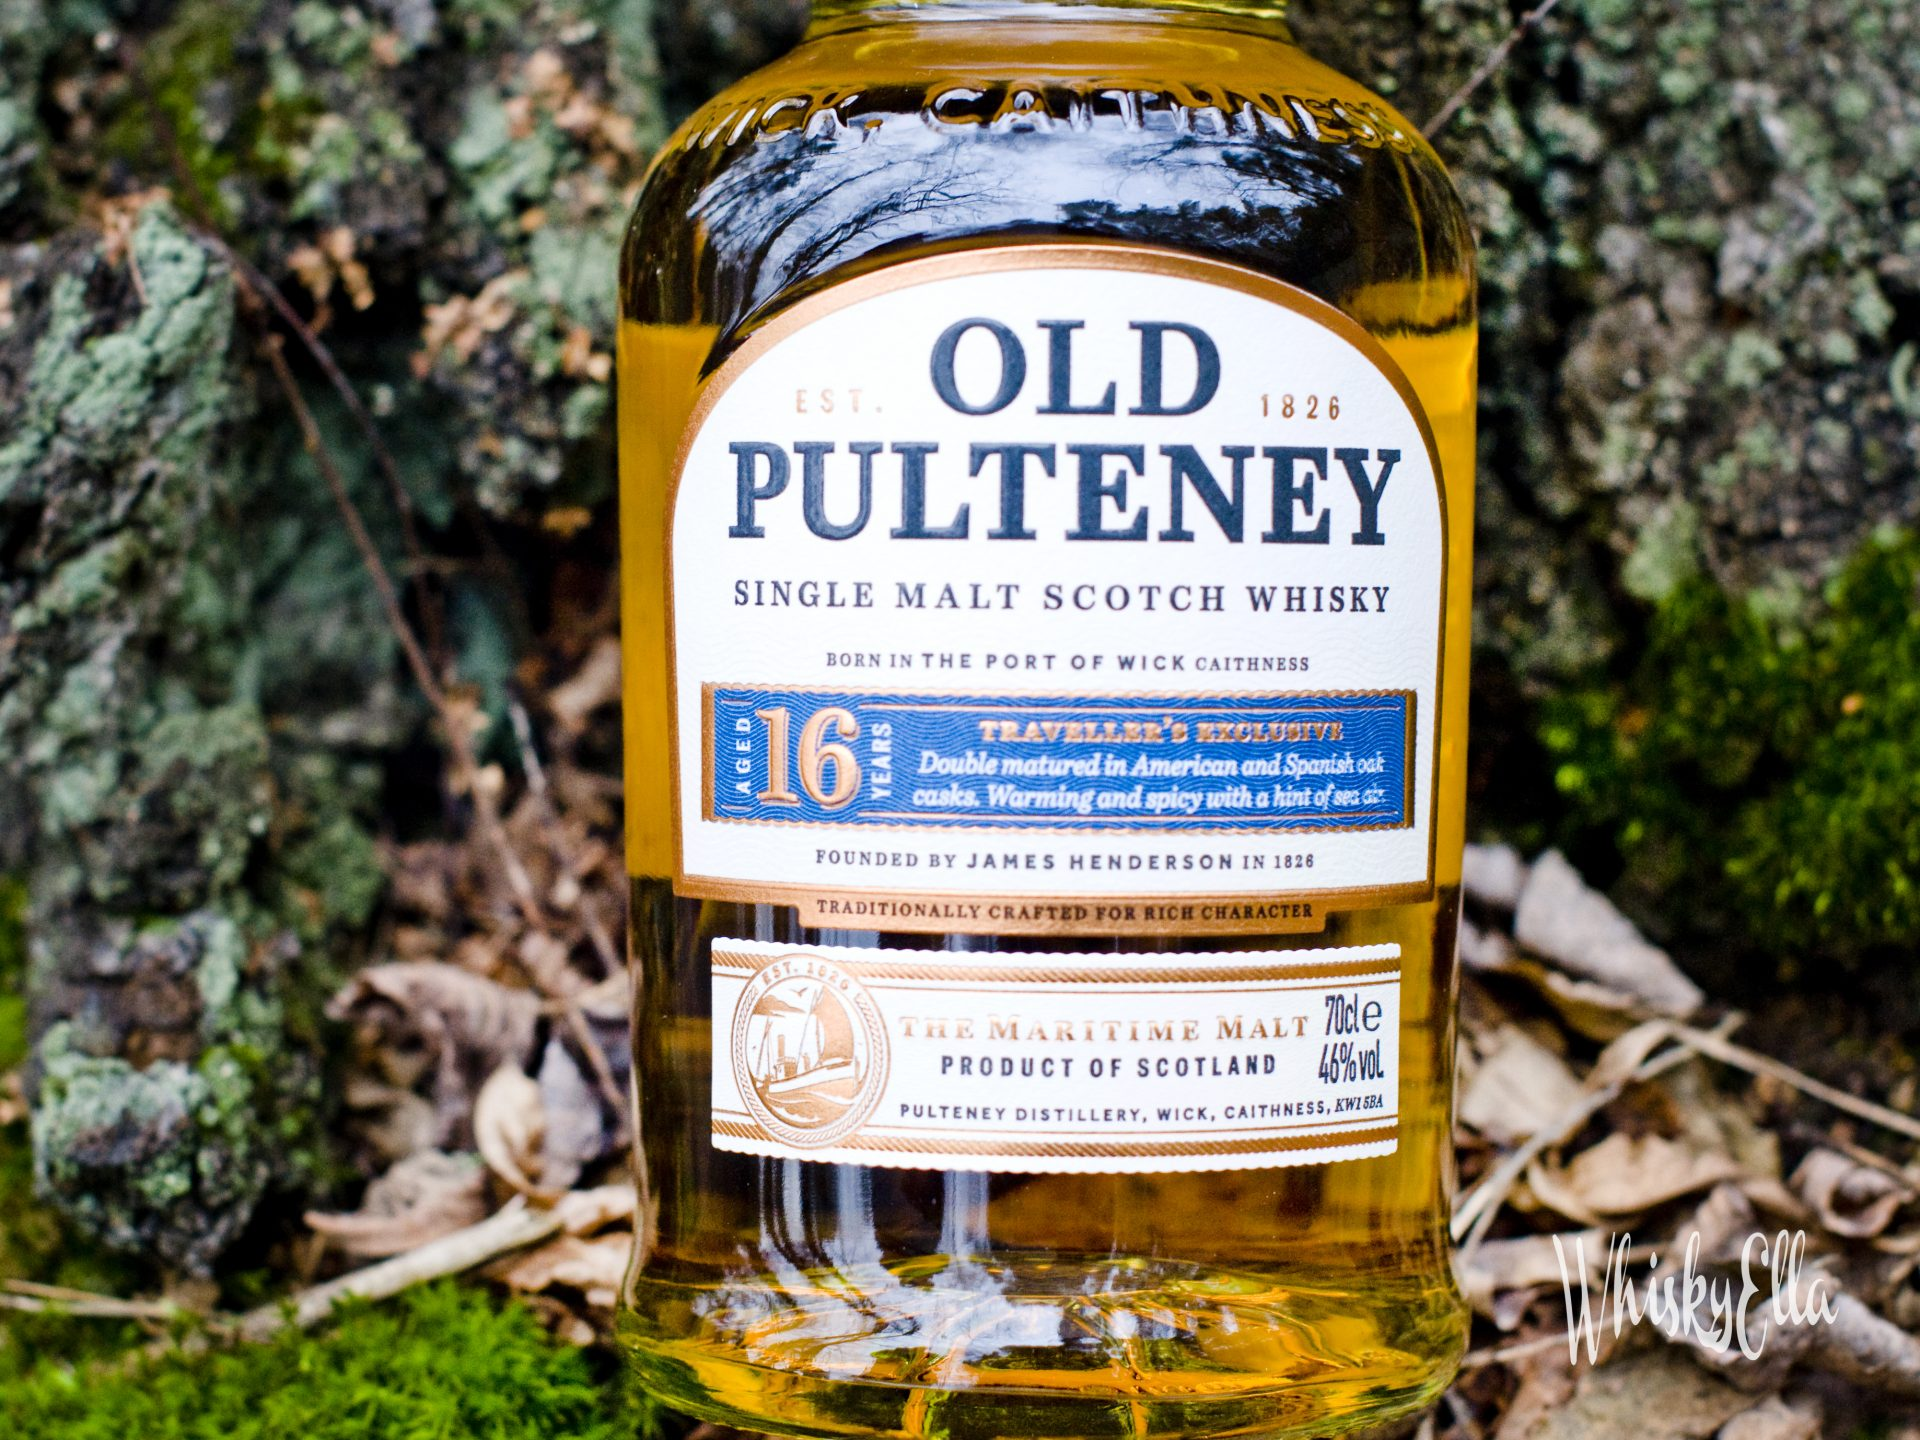 Nasza recenzja Old Pulteney 16 yo #51